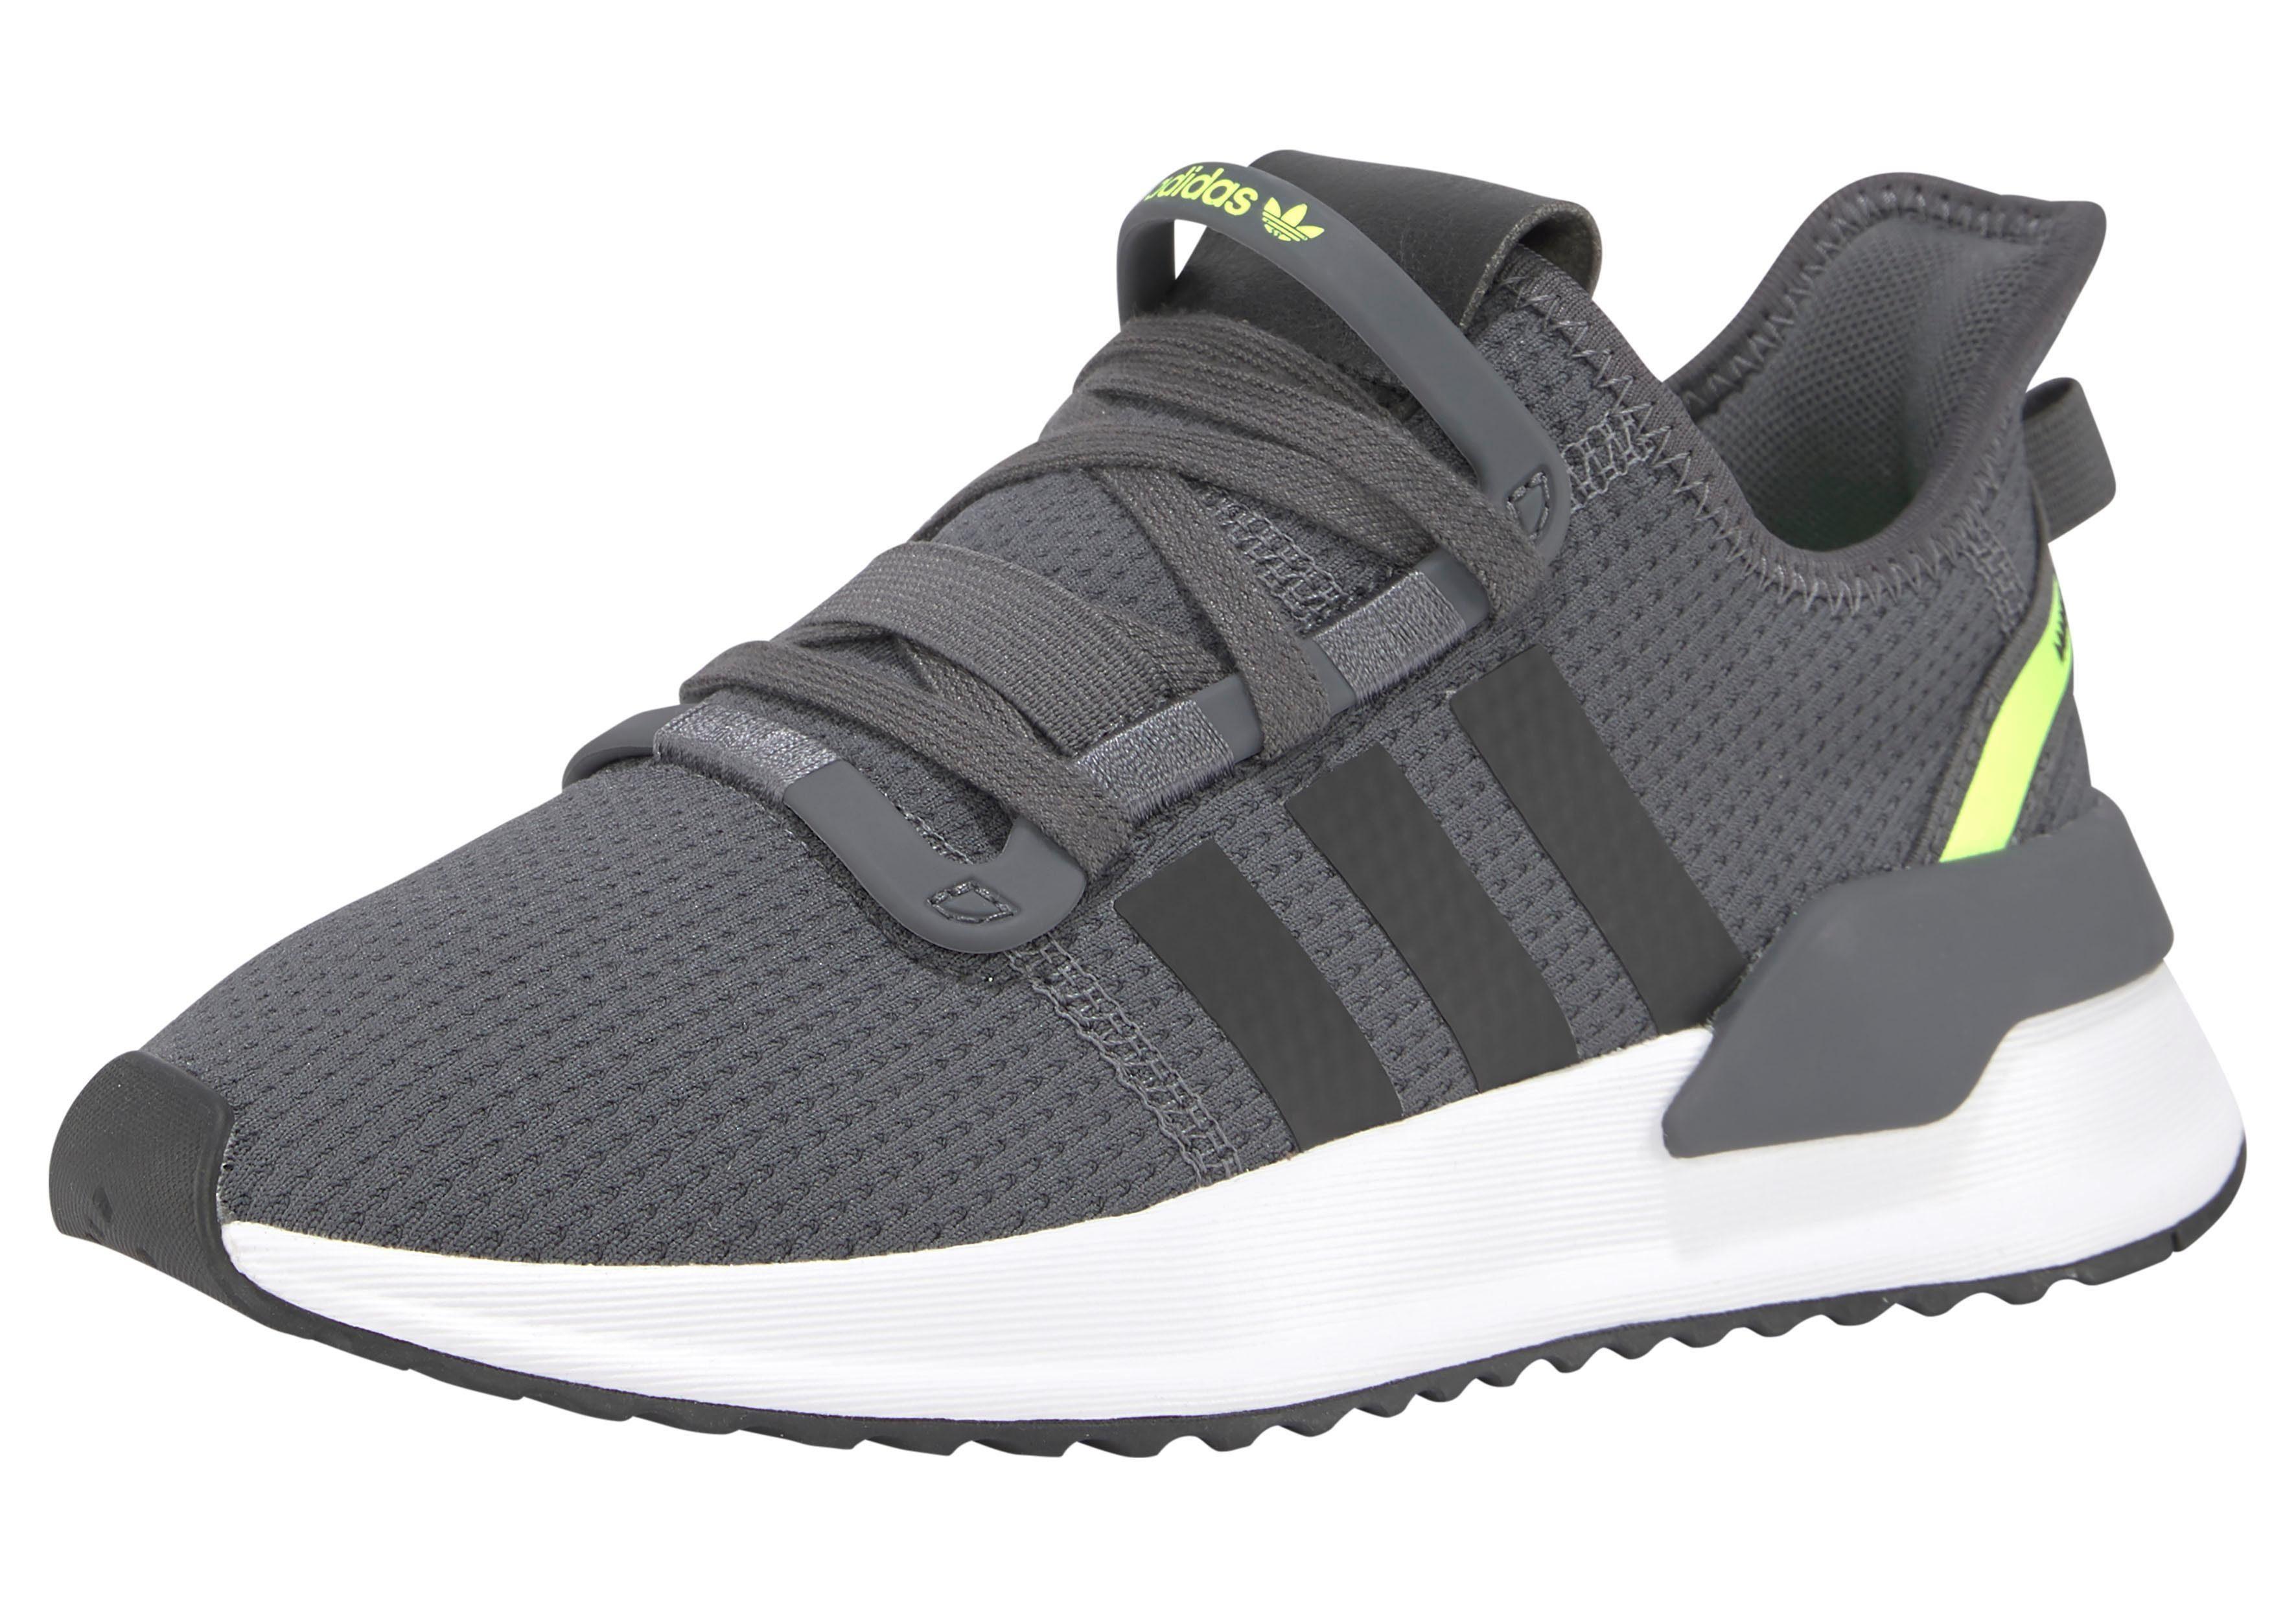 adidas Originals »U_PATH RUN J« Sneaker, Sportlicher Sneaker von adidas Originals online kaufen | OTTO